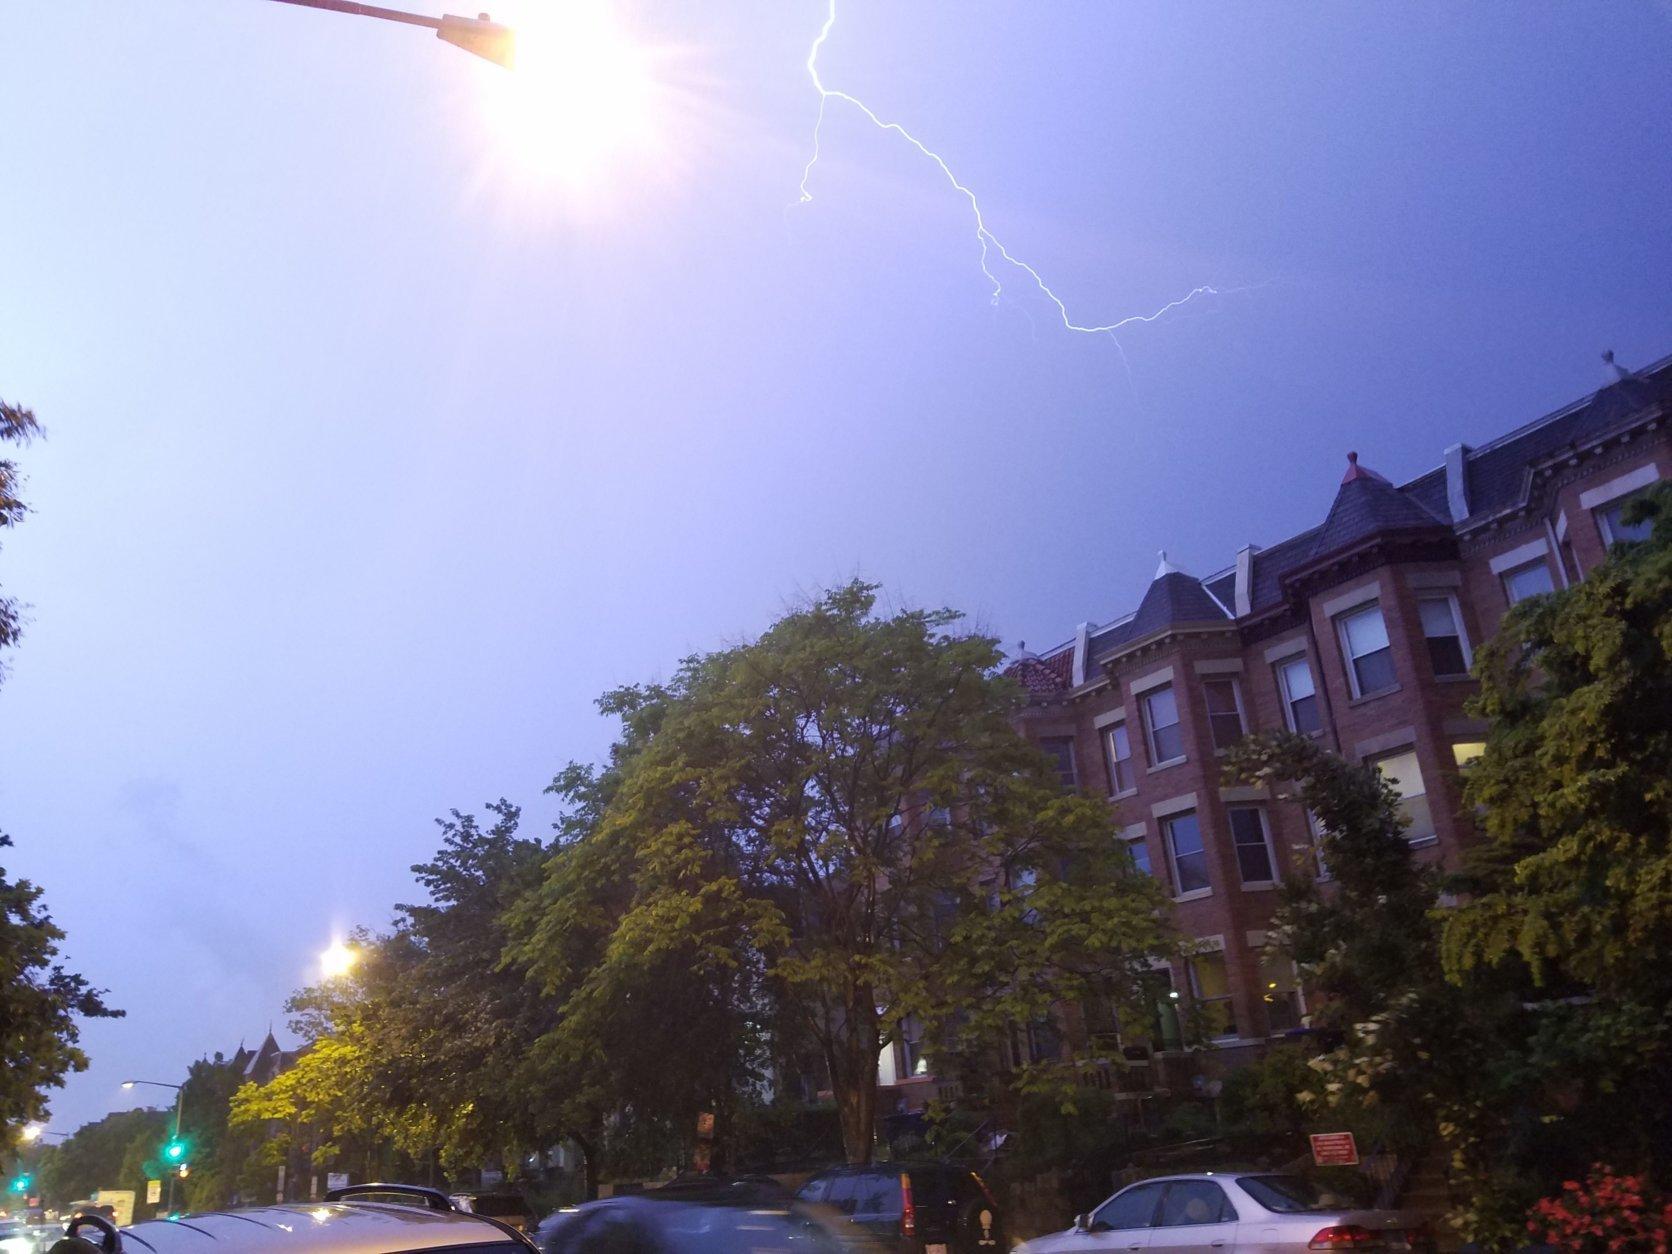 Lightning strikes in D.C.'s Columbia Heights neighborhood. (WTOP/Will Vitka)